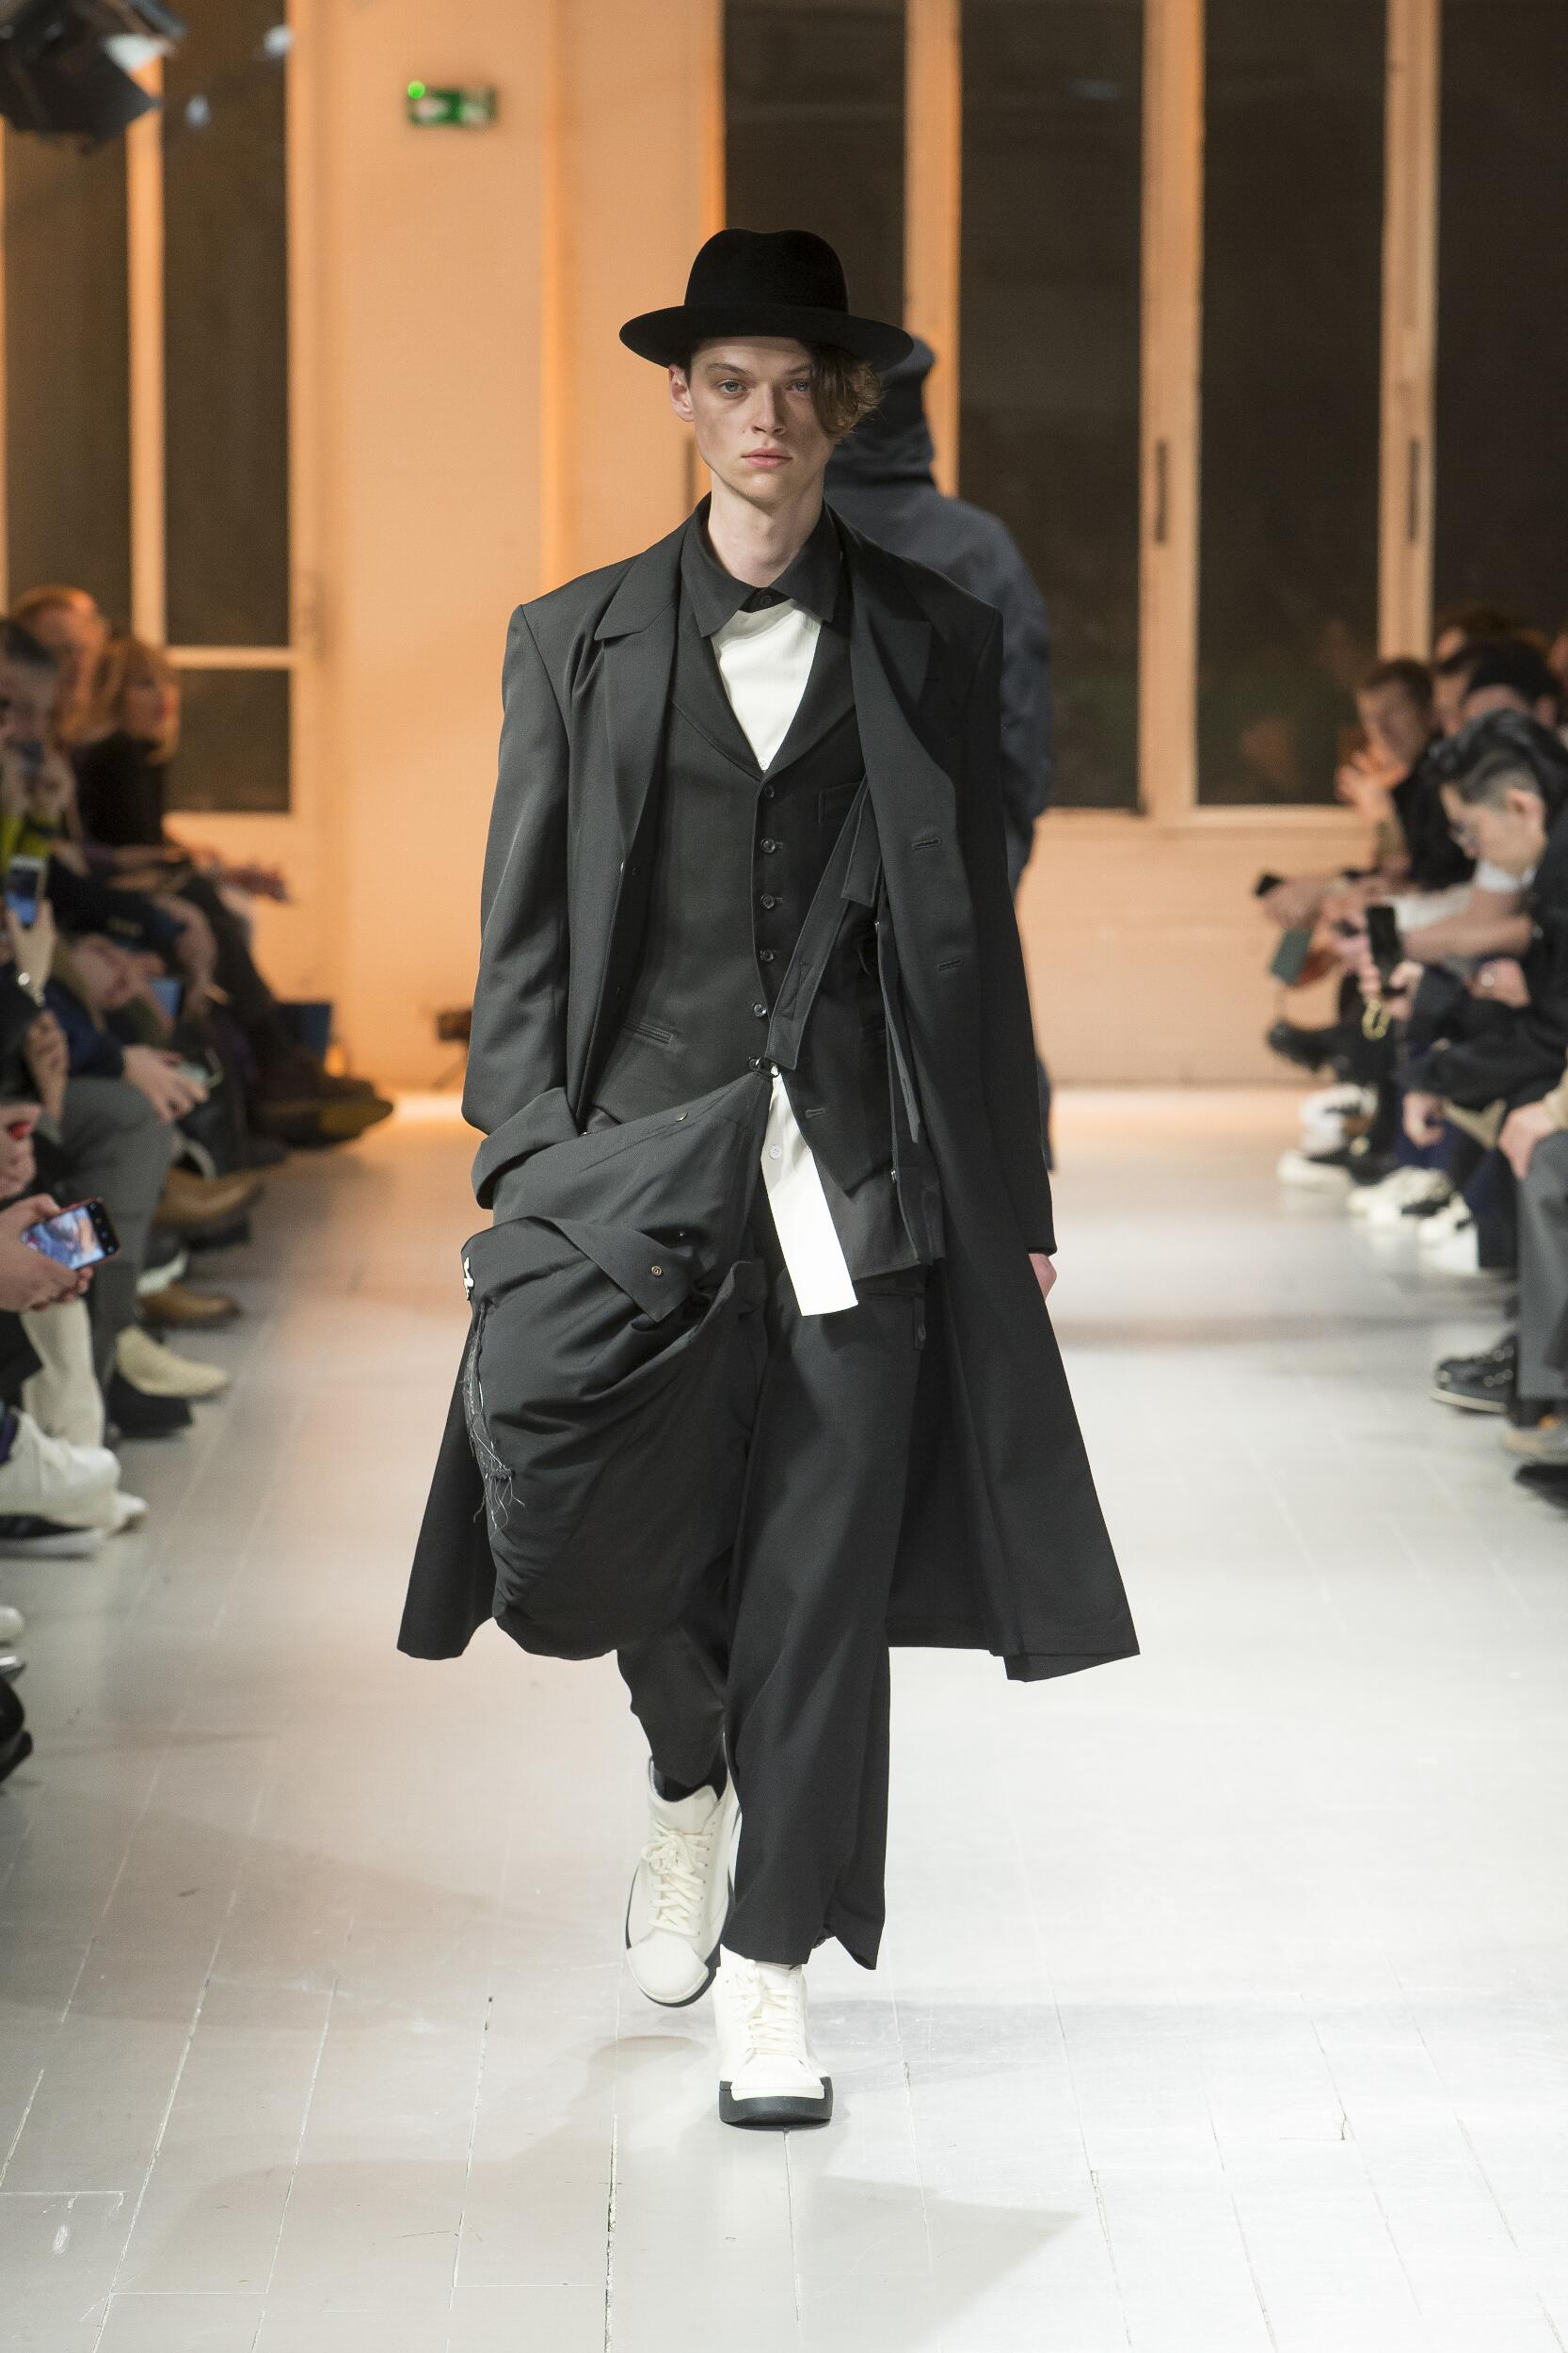 Runway Yohji Yamamoto Fall Winter 2020 Men's Collection Paris Fashion Week